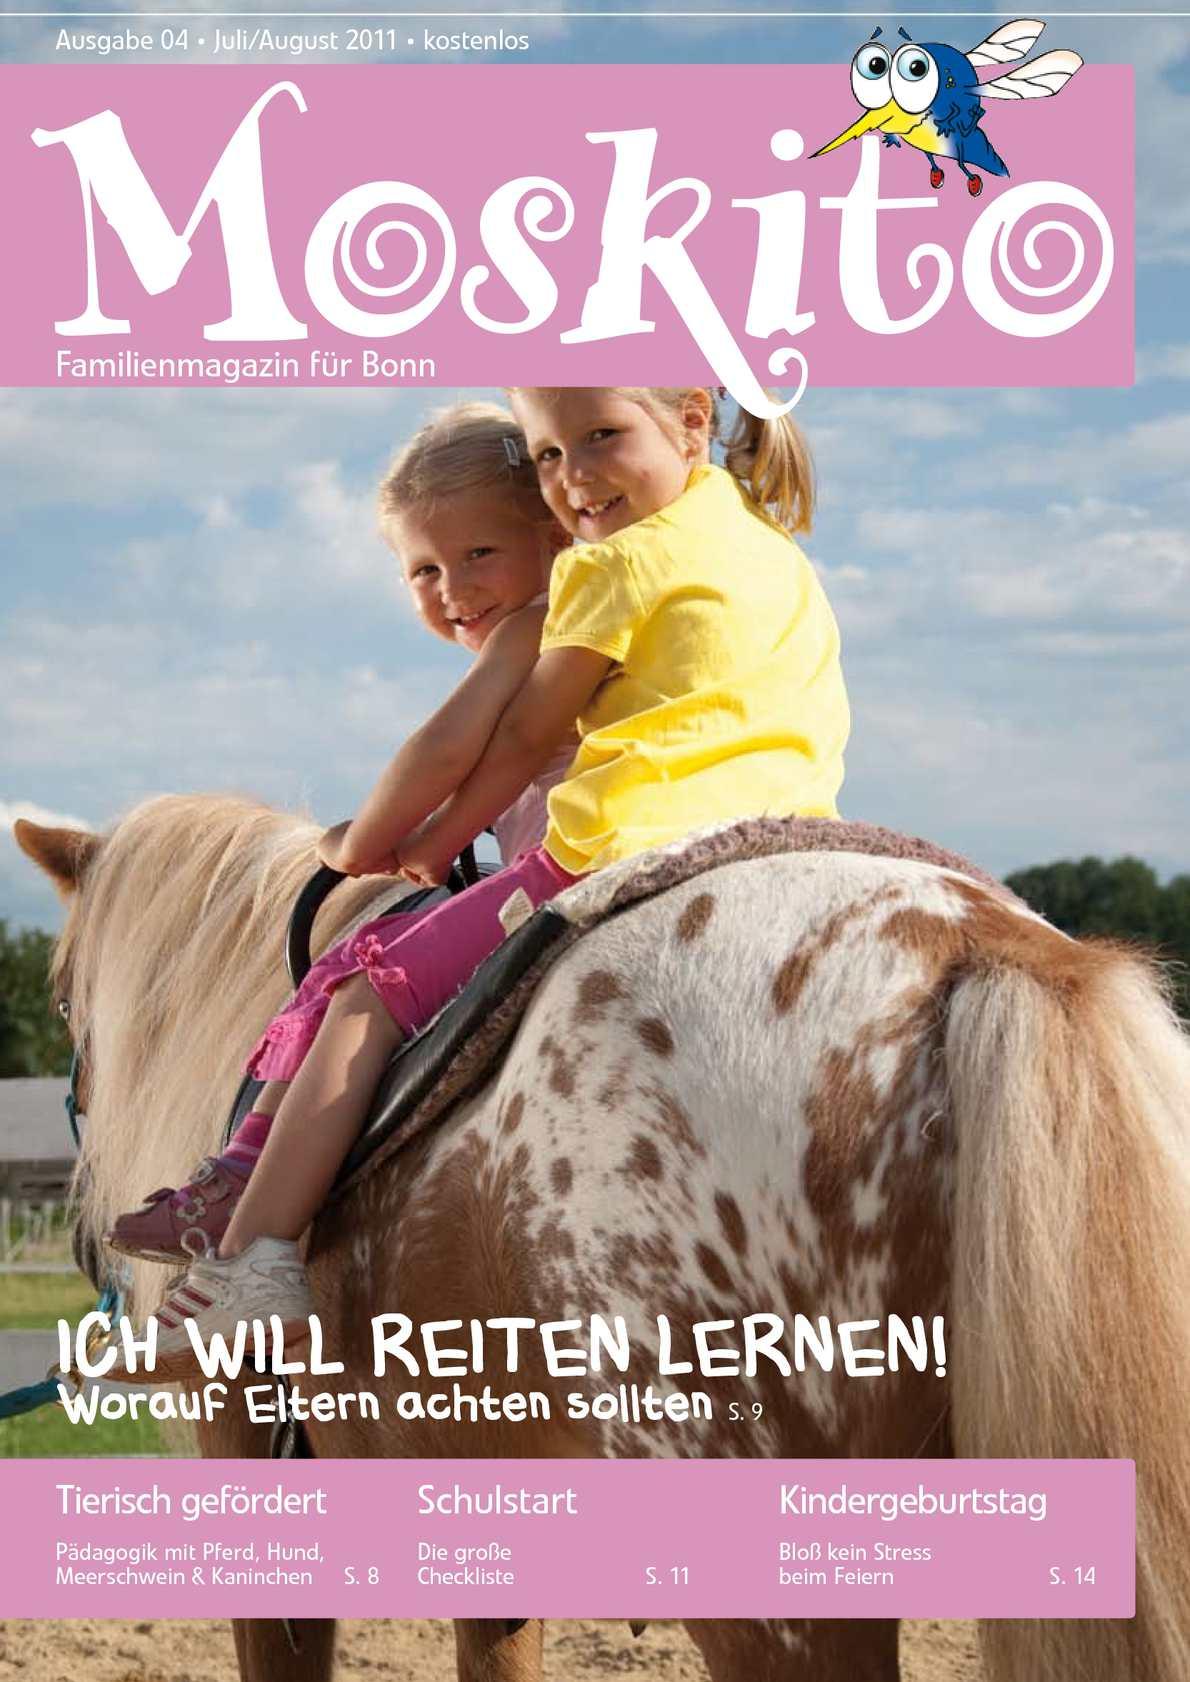 Calaméo - Moskito Familienmagazin für Bonn